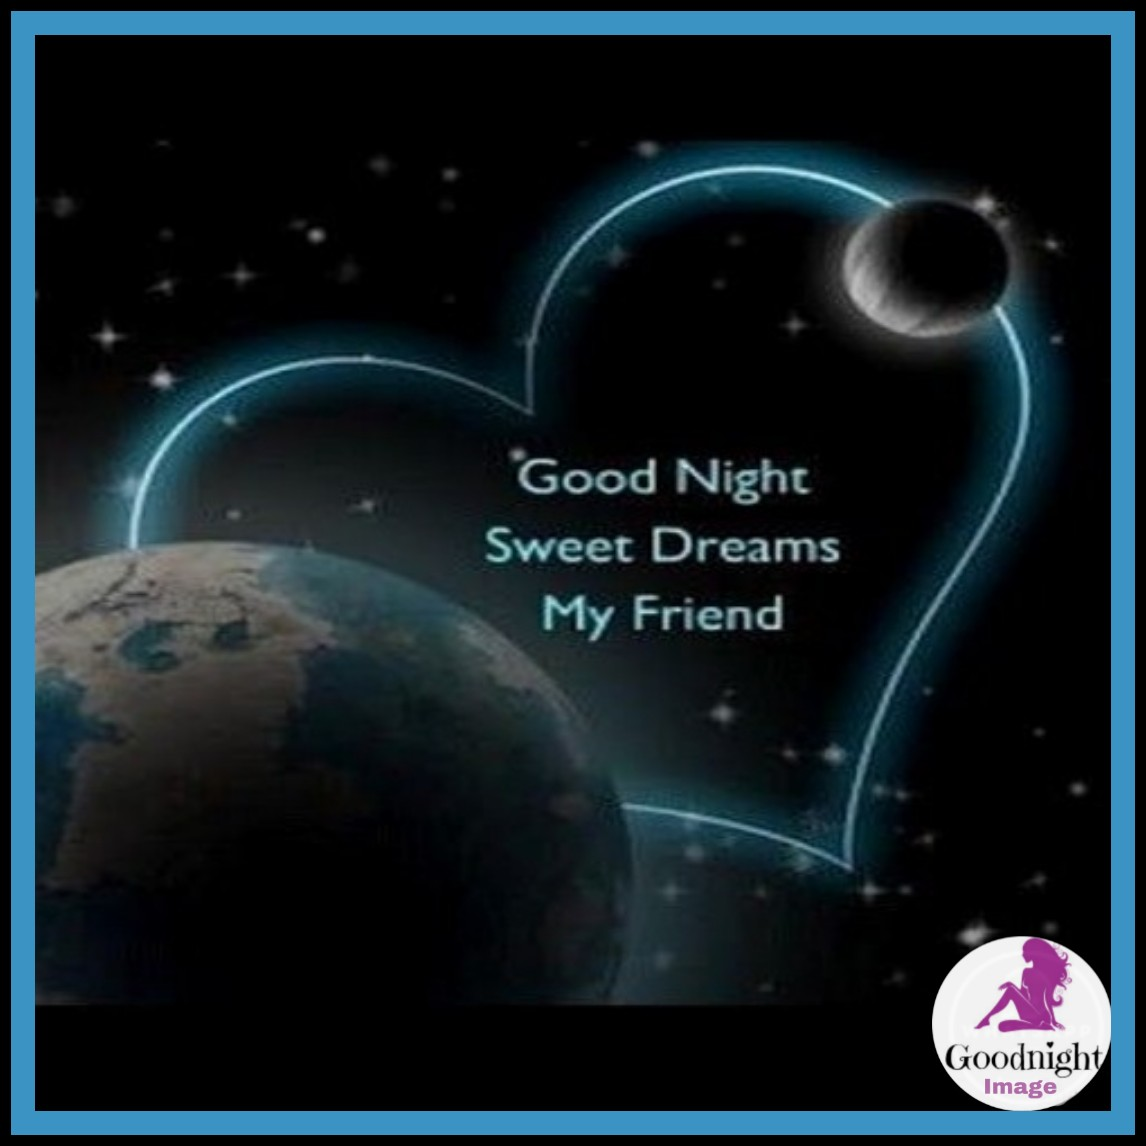 Good Night%2BImage 6